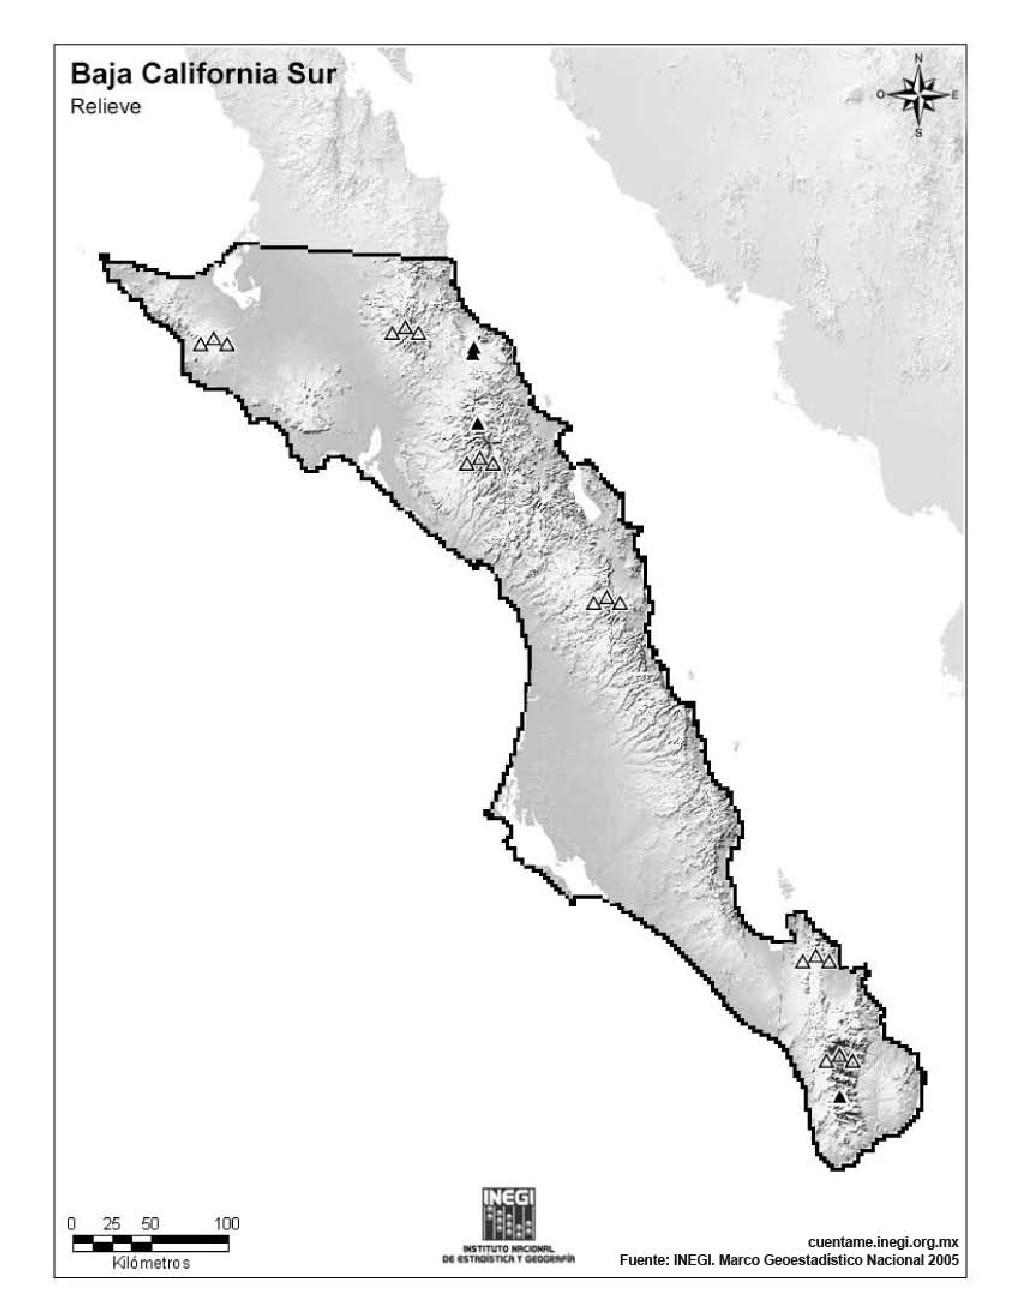 Mapa mudo de montañas de Baja California Sur. INEGI de México